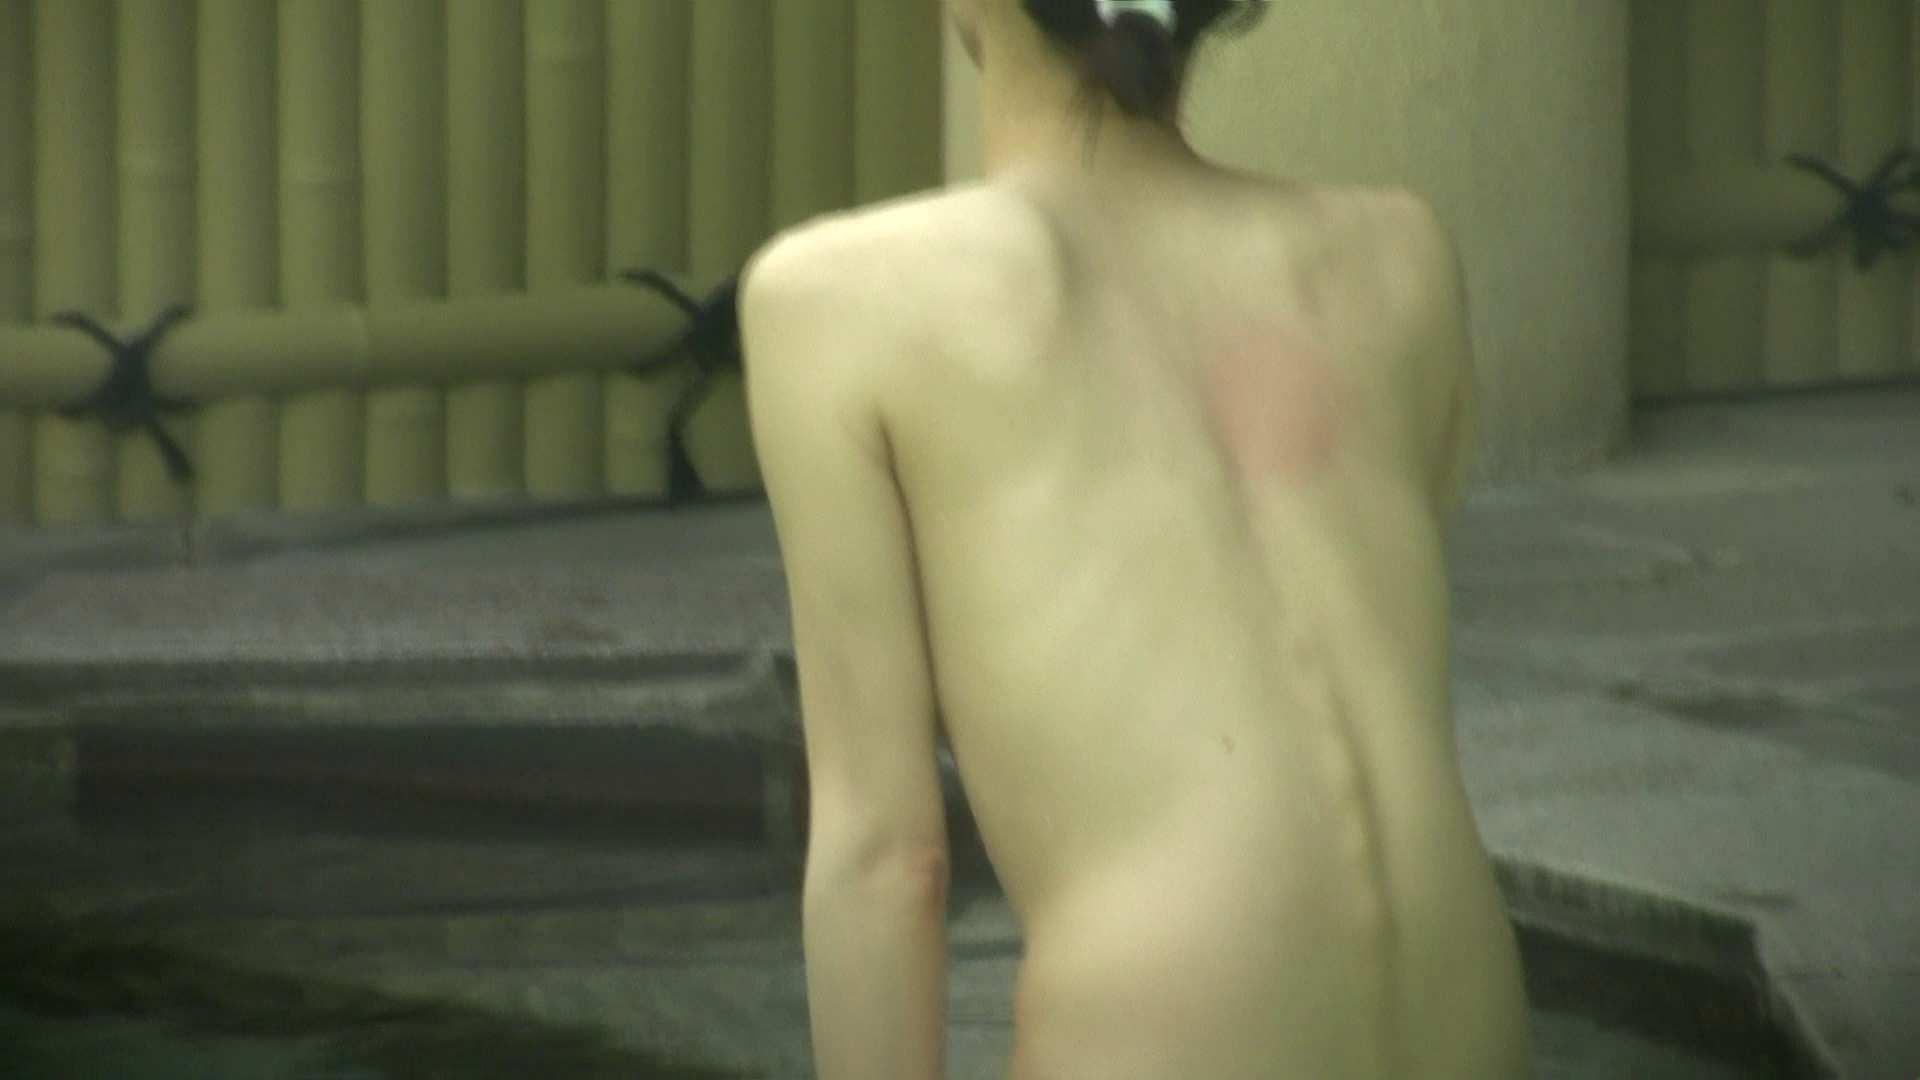 Aquaな露天風呂Vol.631 盗撮  109連発 41